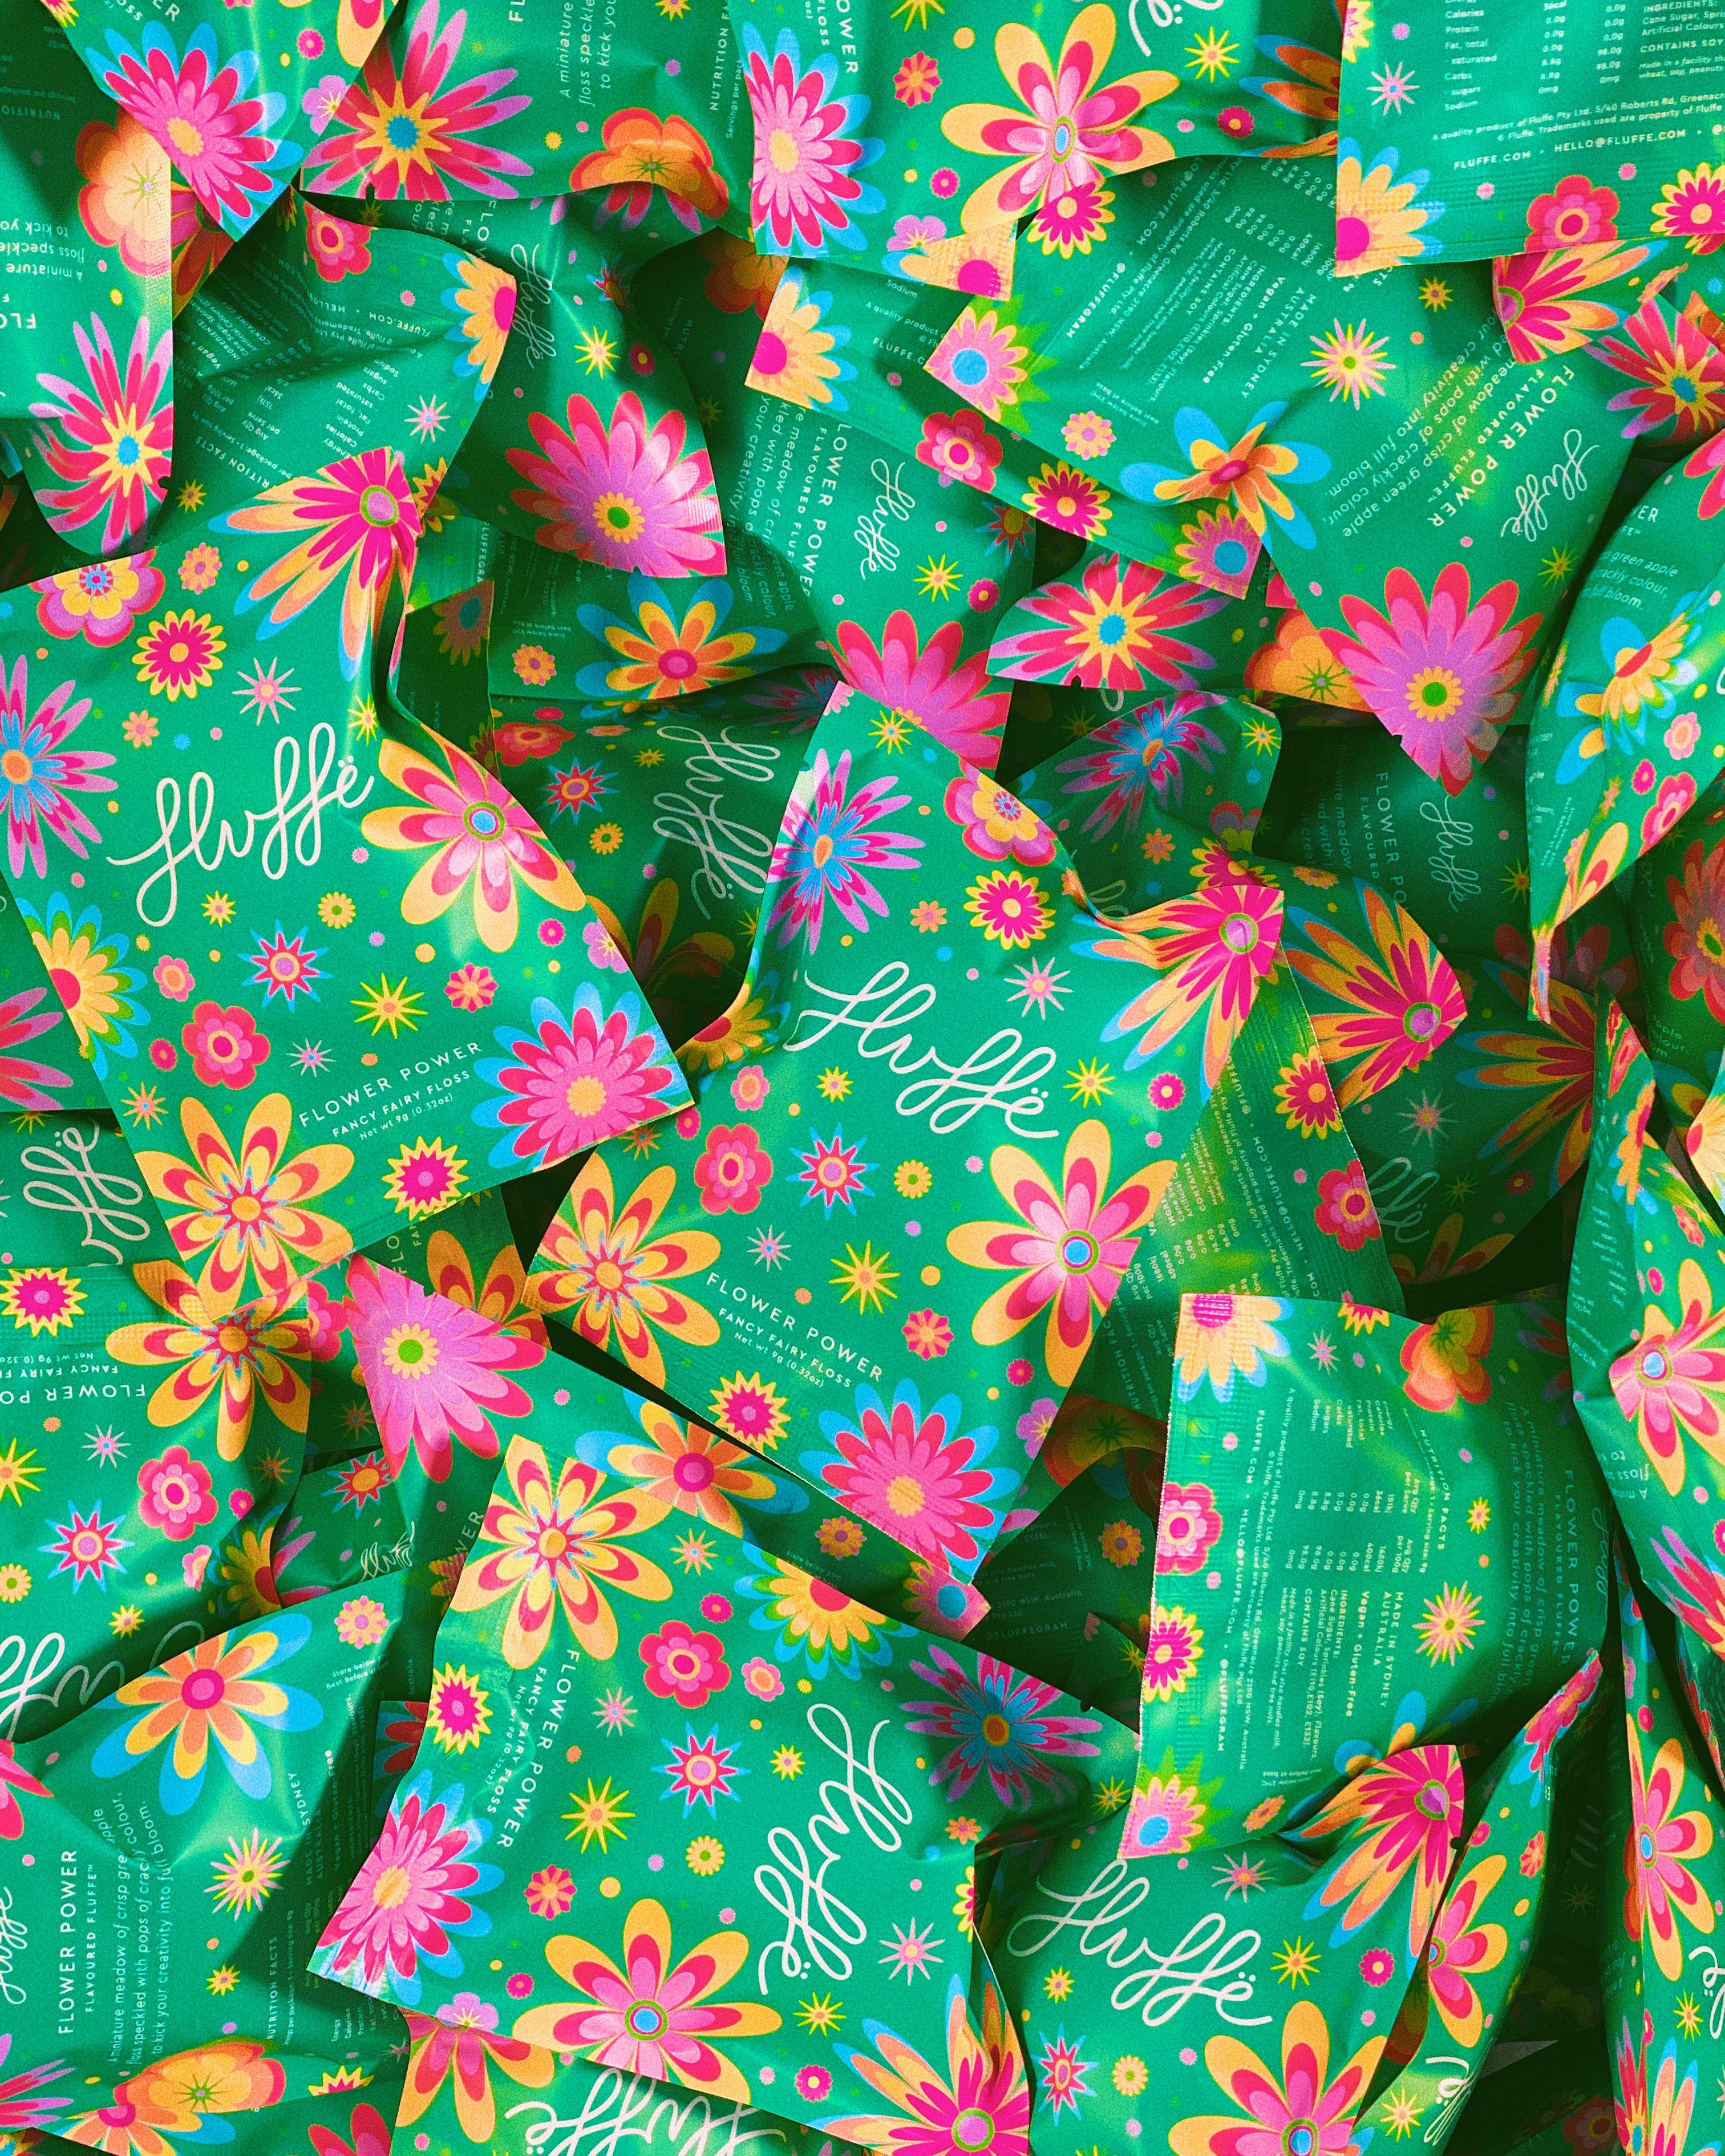 Fluffe Flower Power In 2020 Rainbow Sprinkles Fairy Floss Flowers